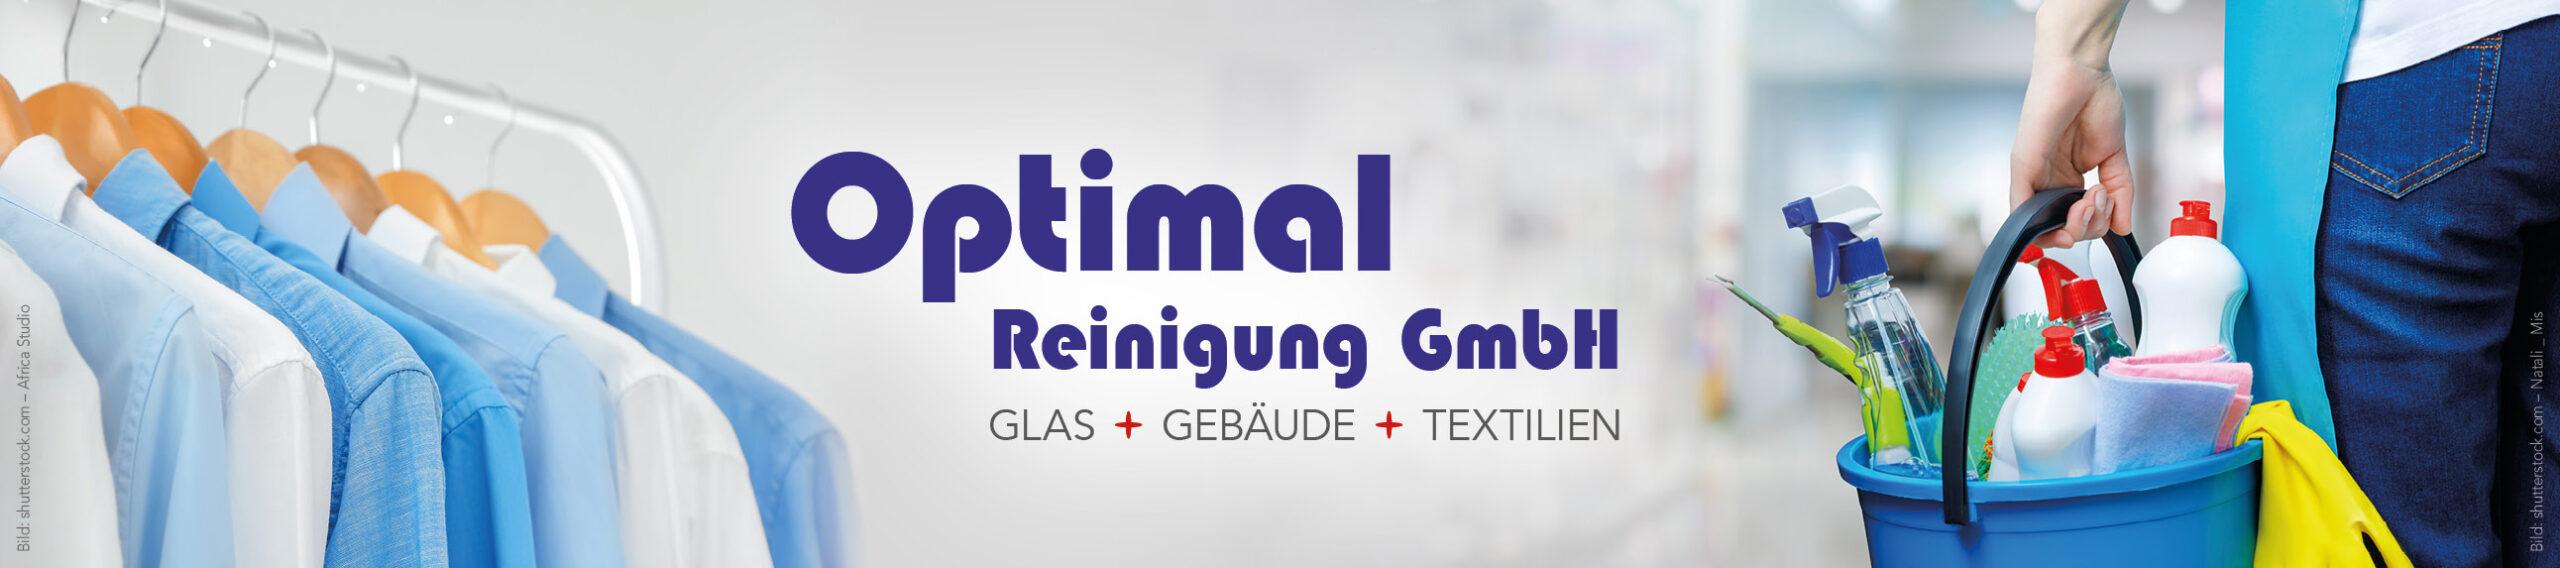 Optimal Reinigung GmbH